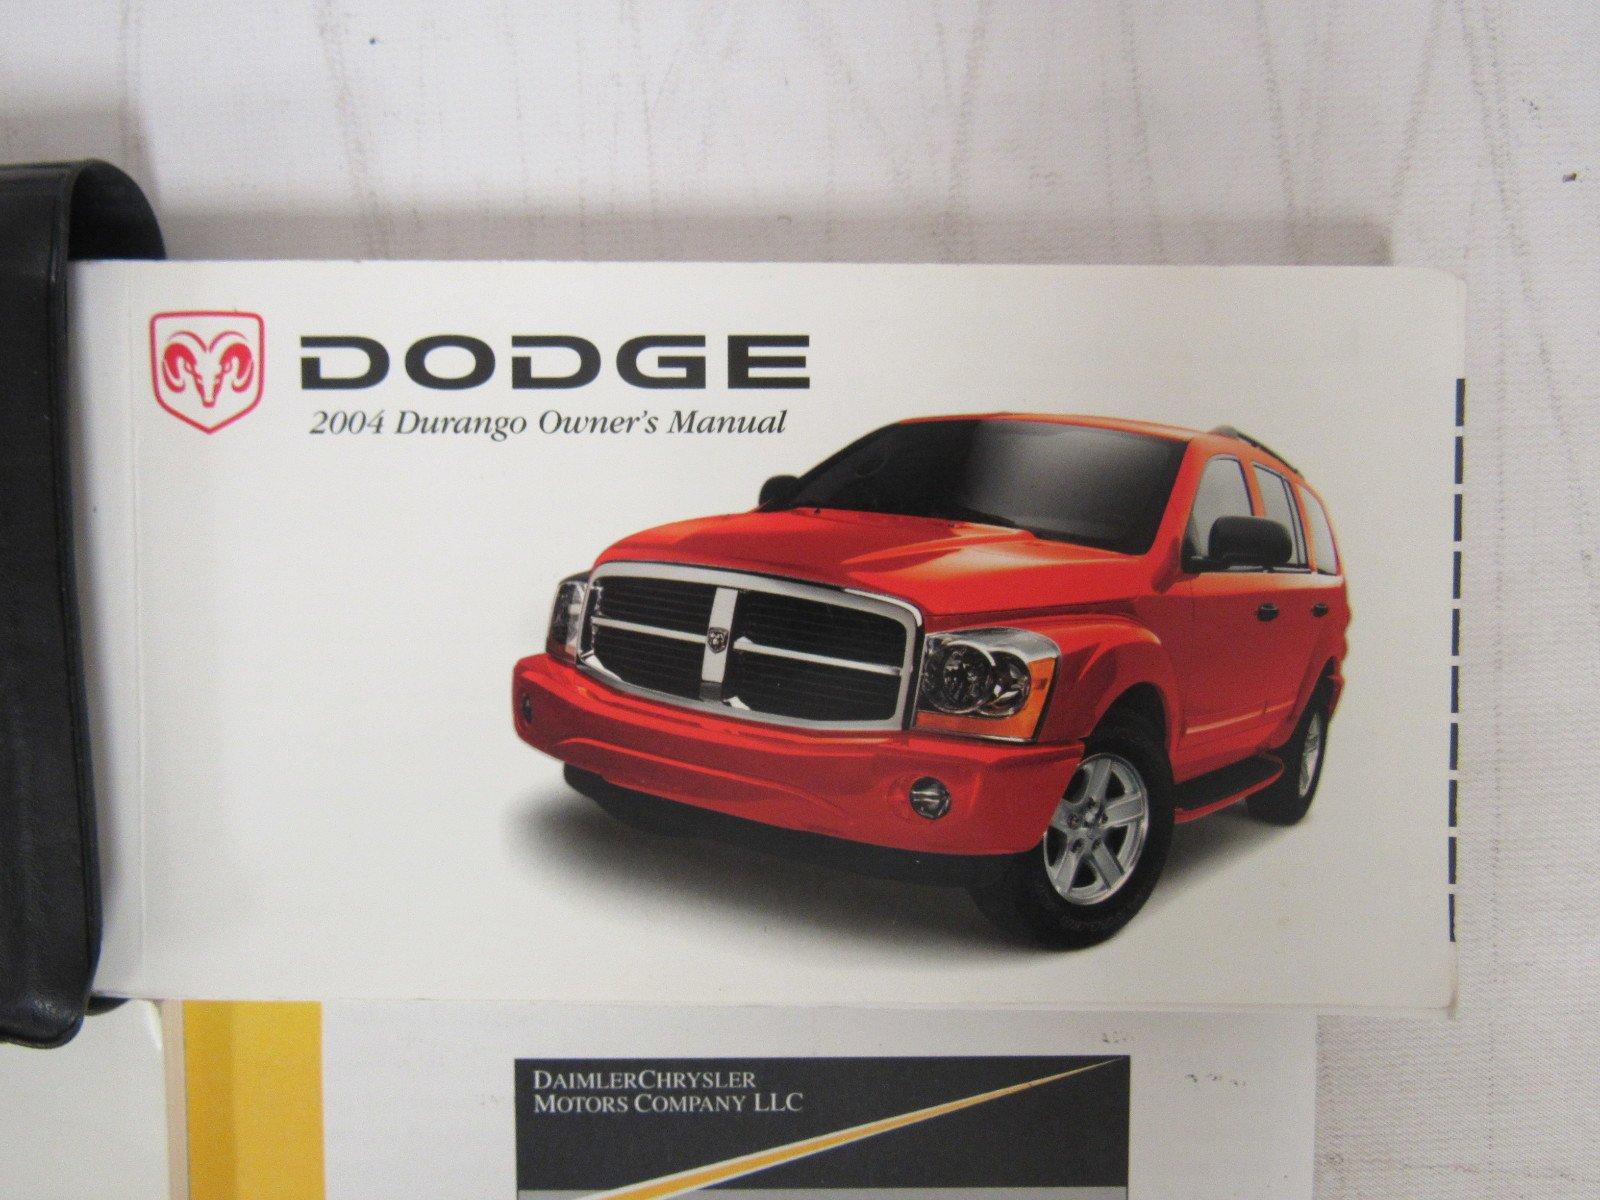 2004 dodge durango user manual